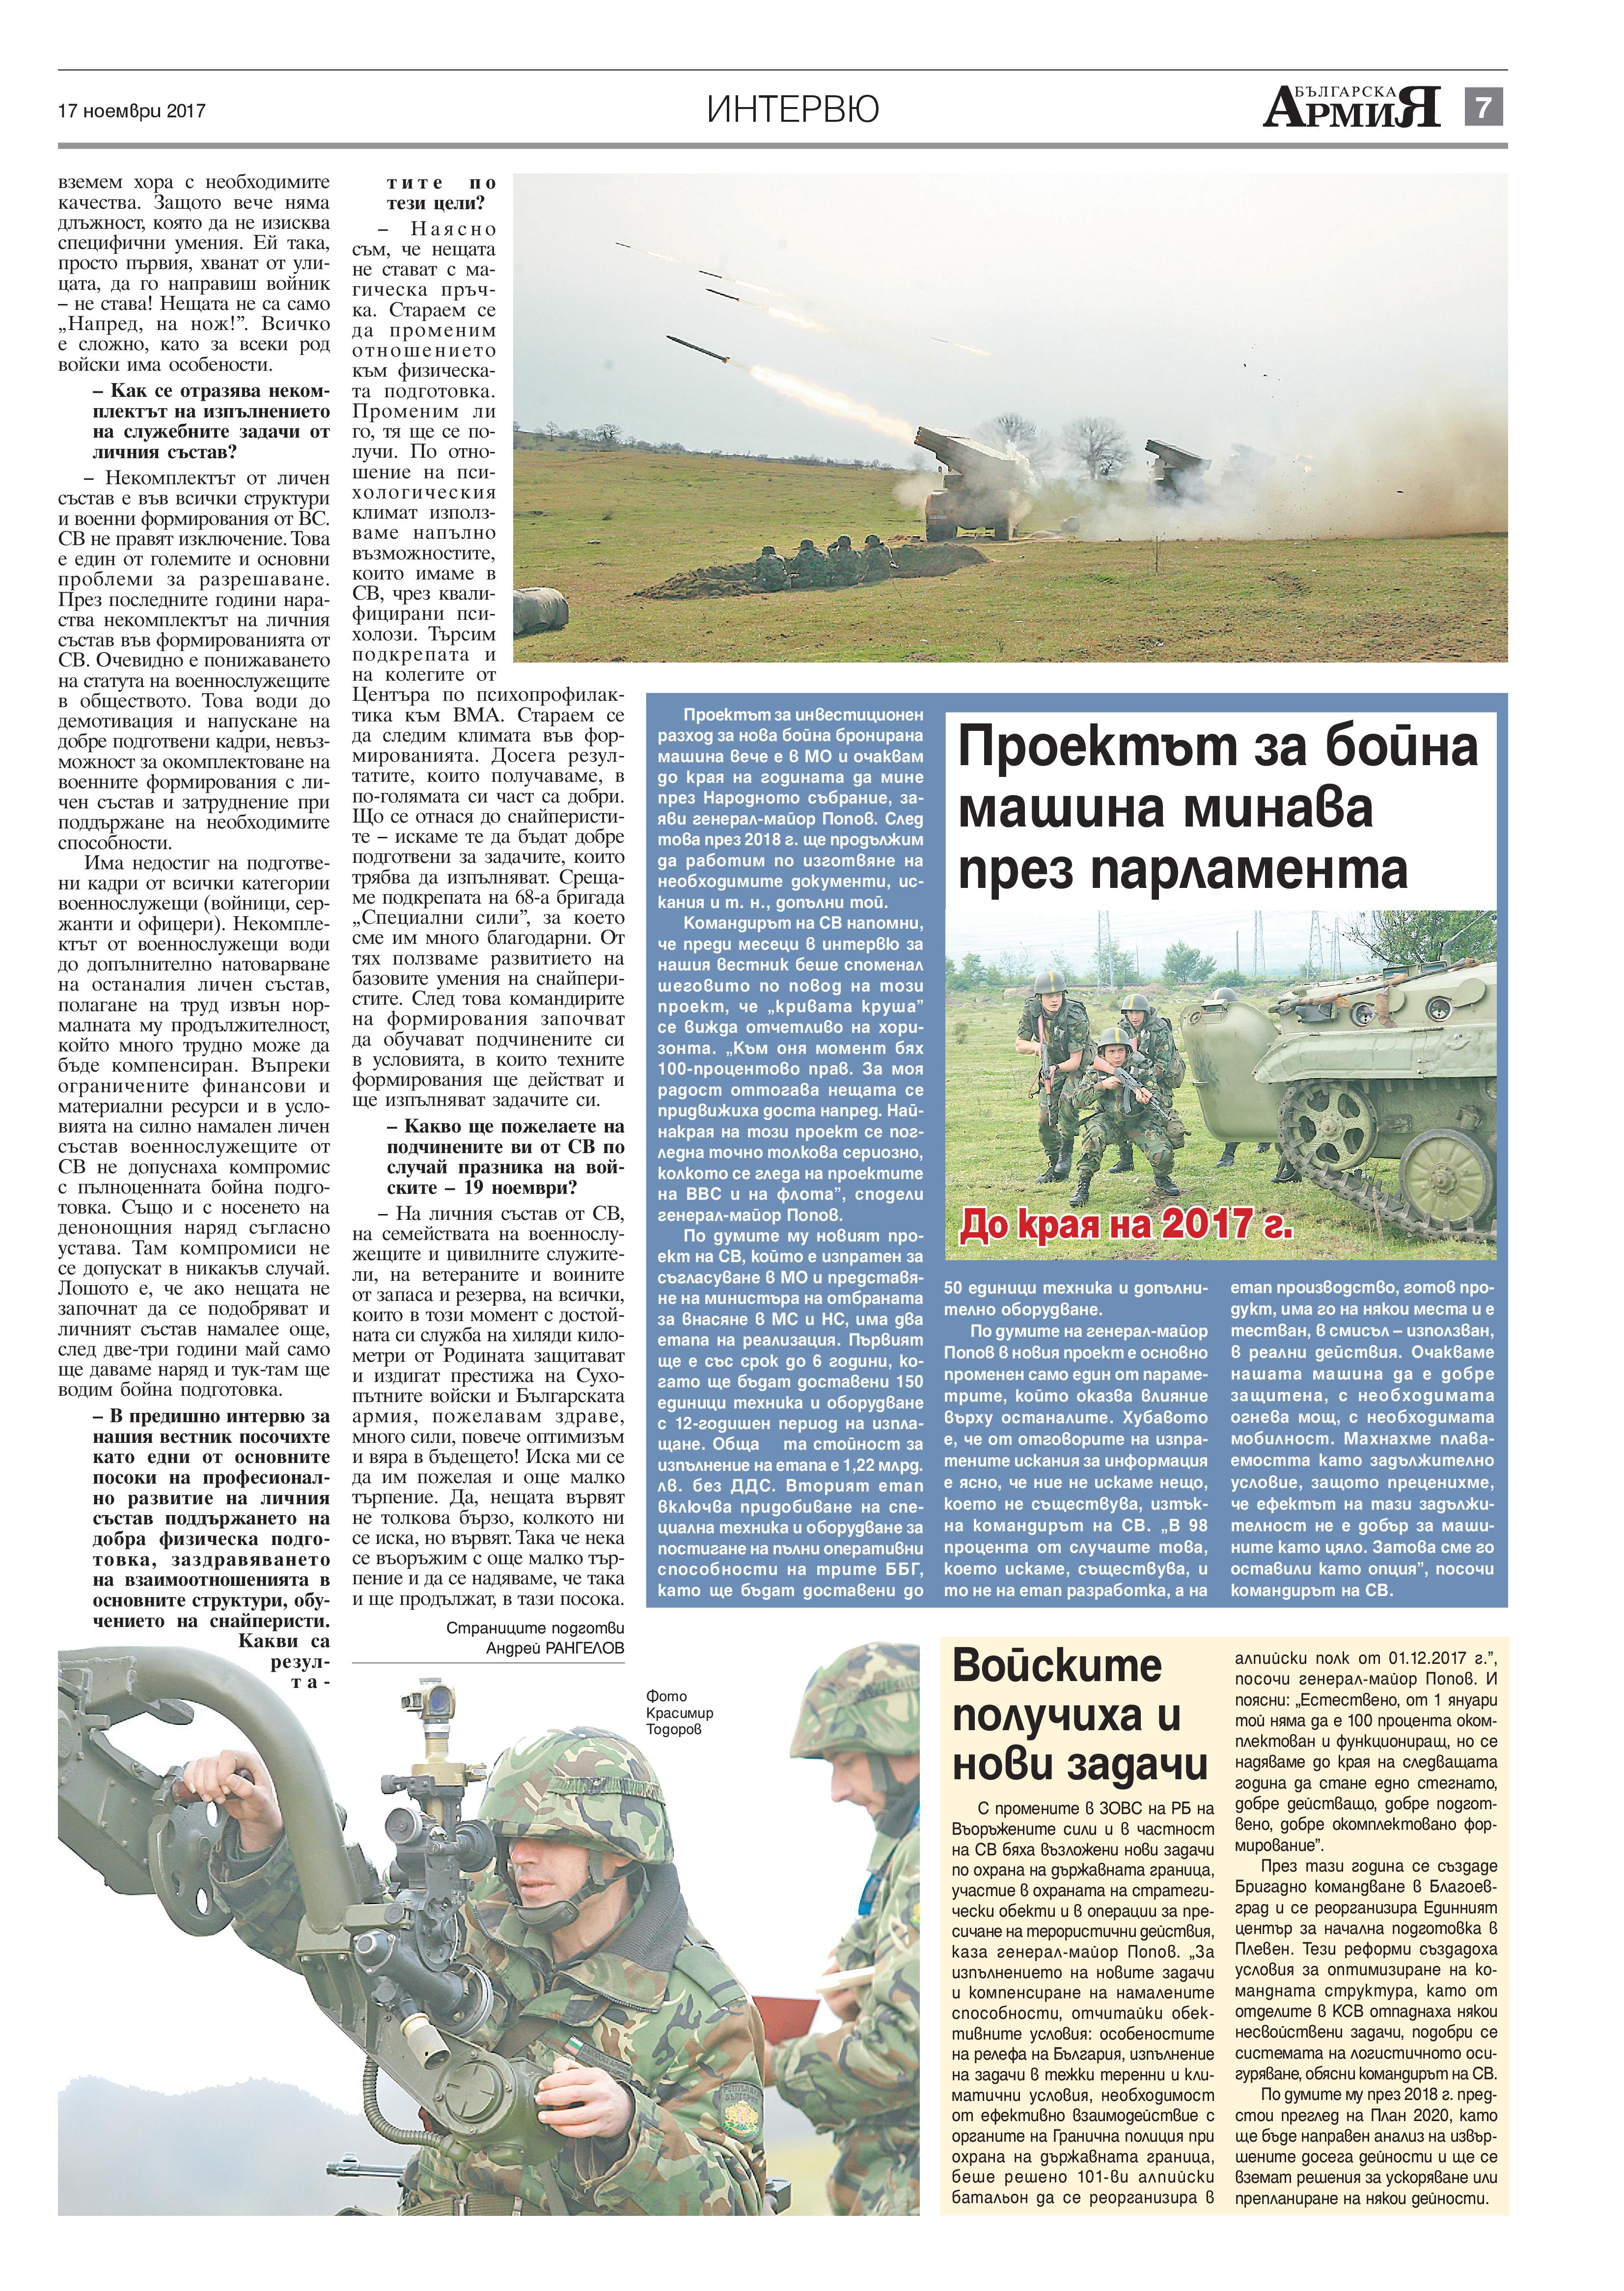 http://armymedia.bg/wp-content/uploads/2015/06/07-11.jpg